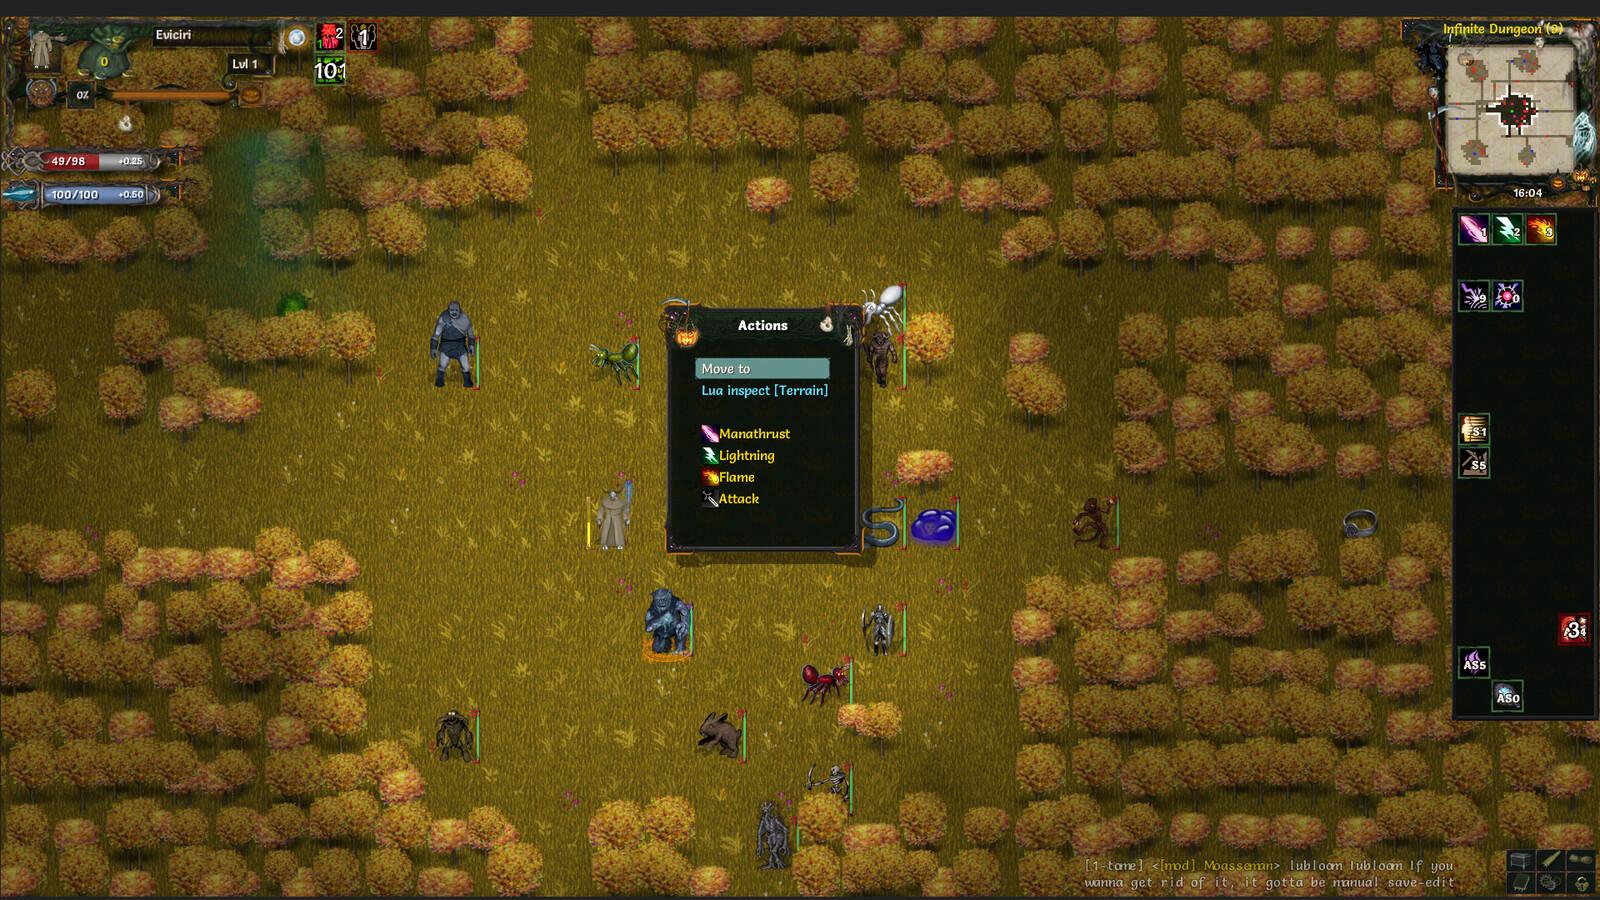 Wild Plumpkin UI ingame